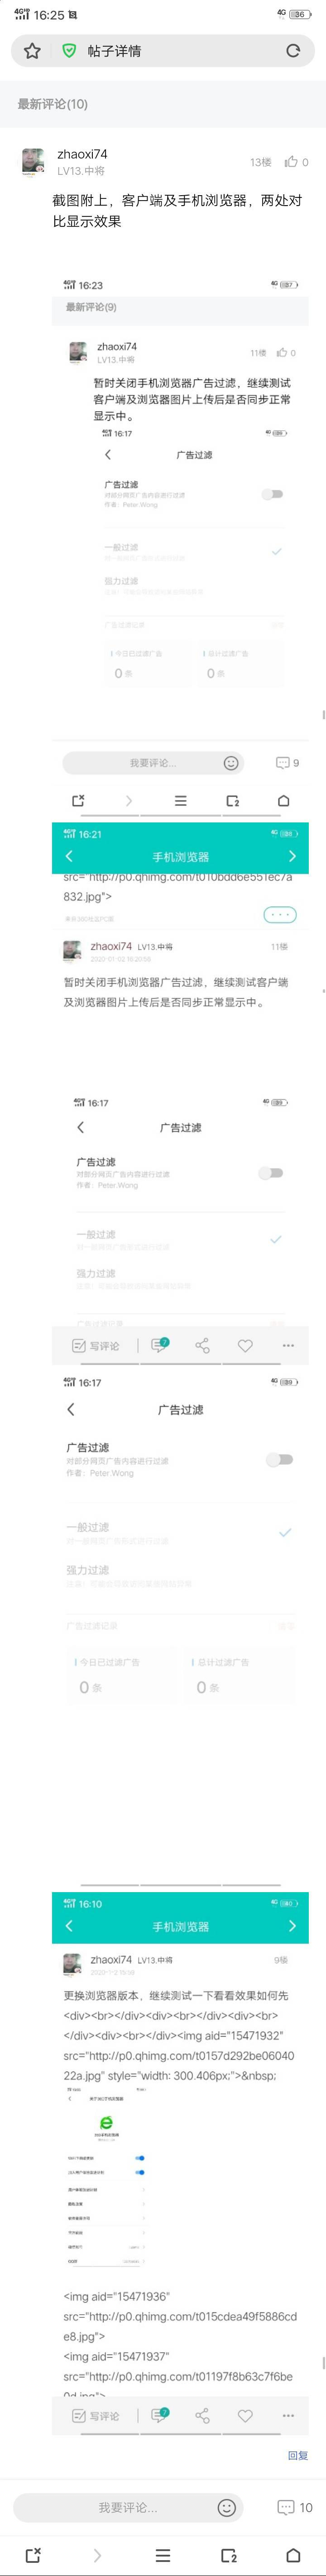 Screenshot_2020_0102_162540_compress.jpg